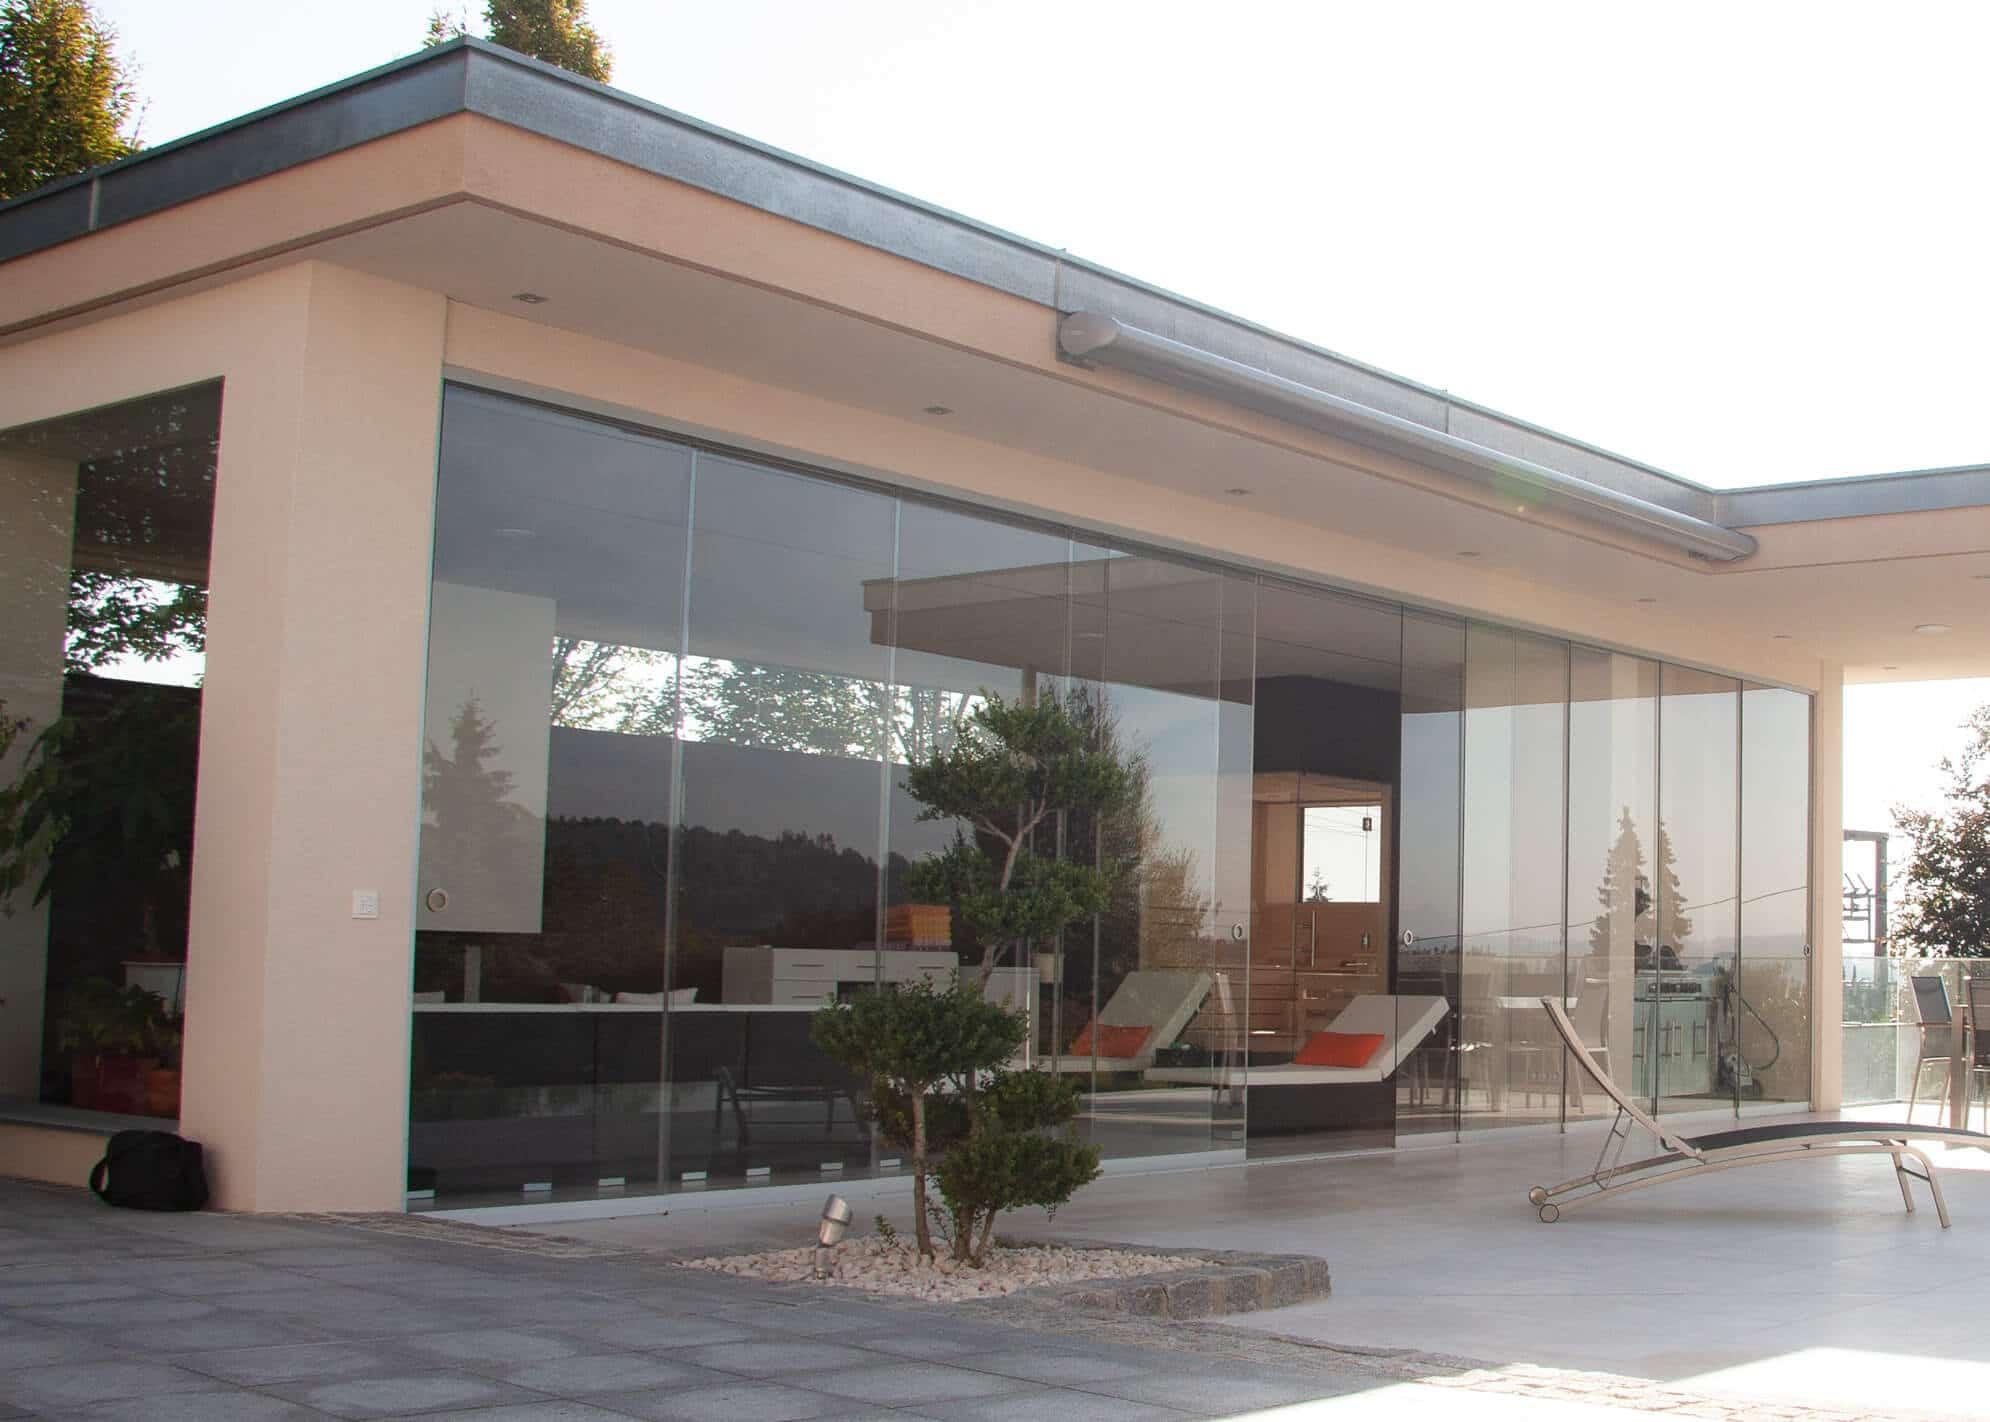 Glasschiebewand Terrasse Ideen